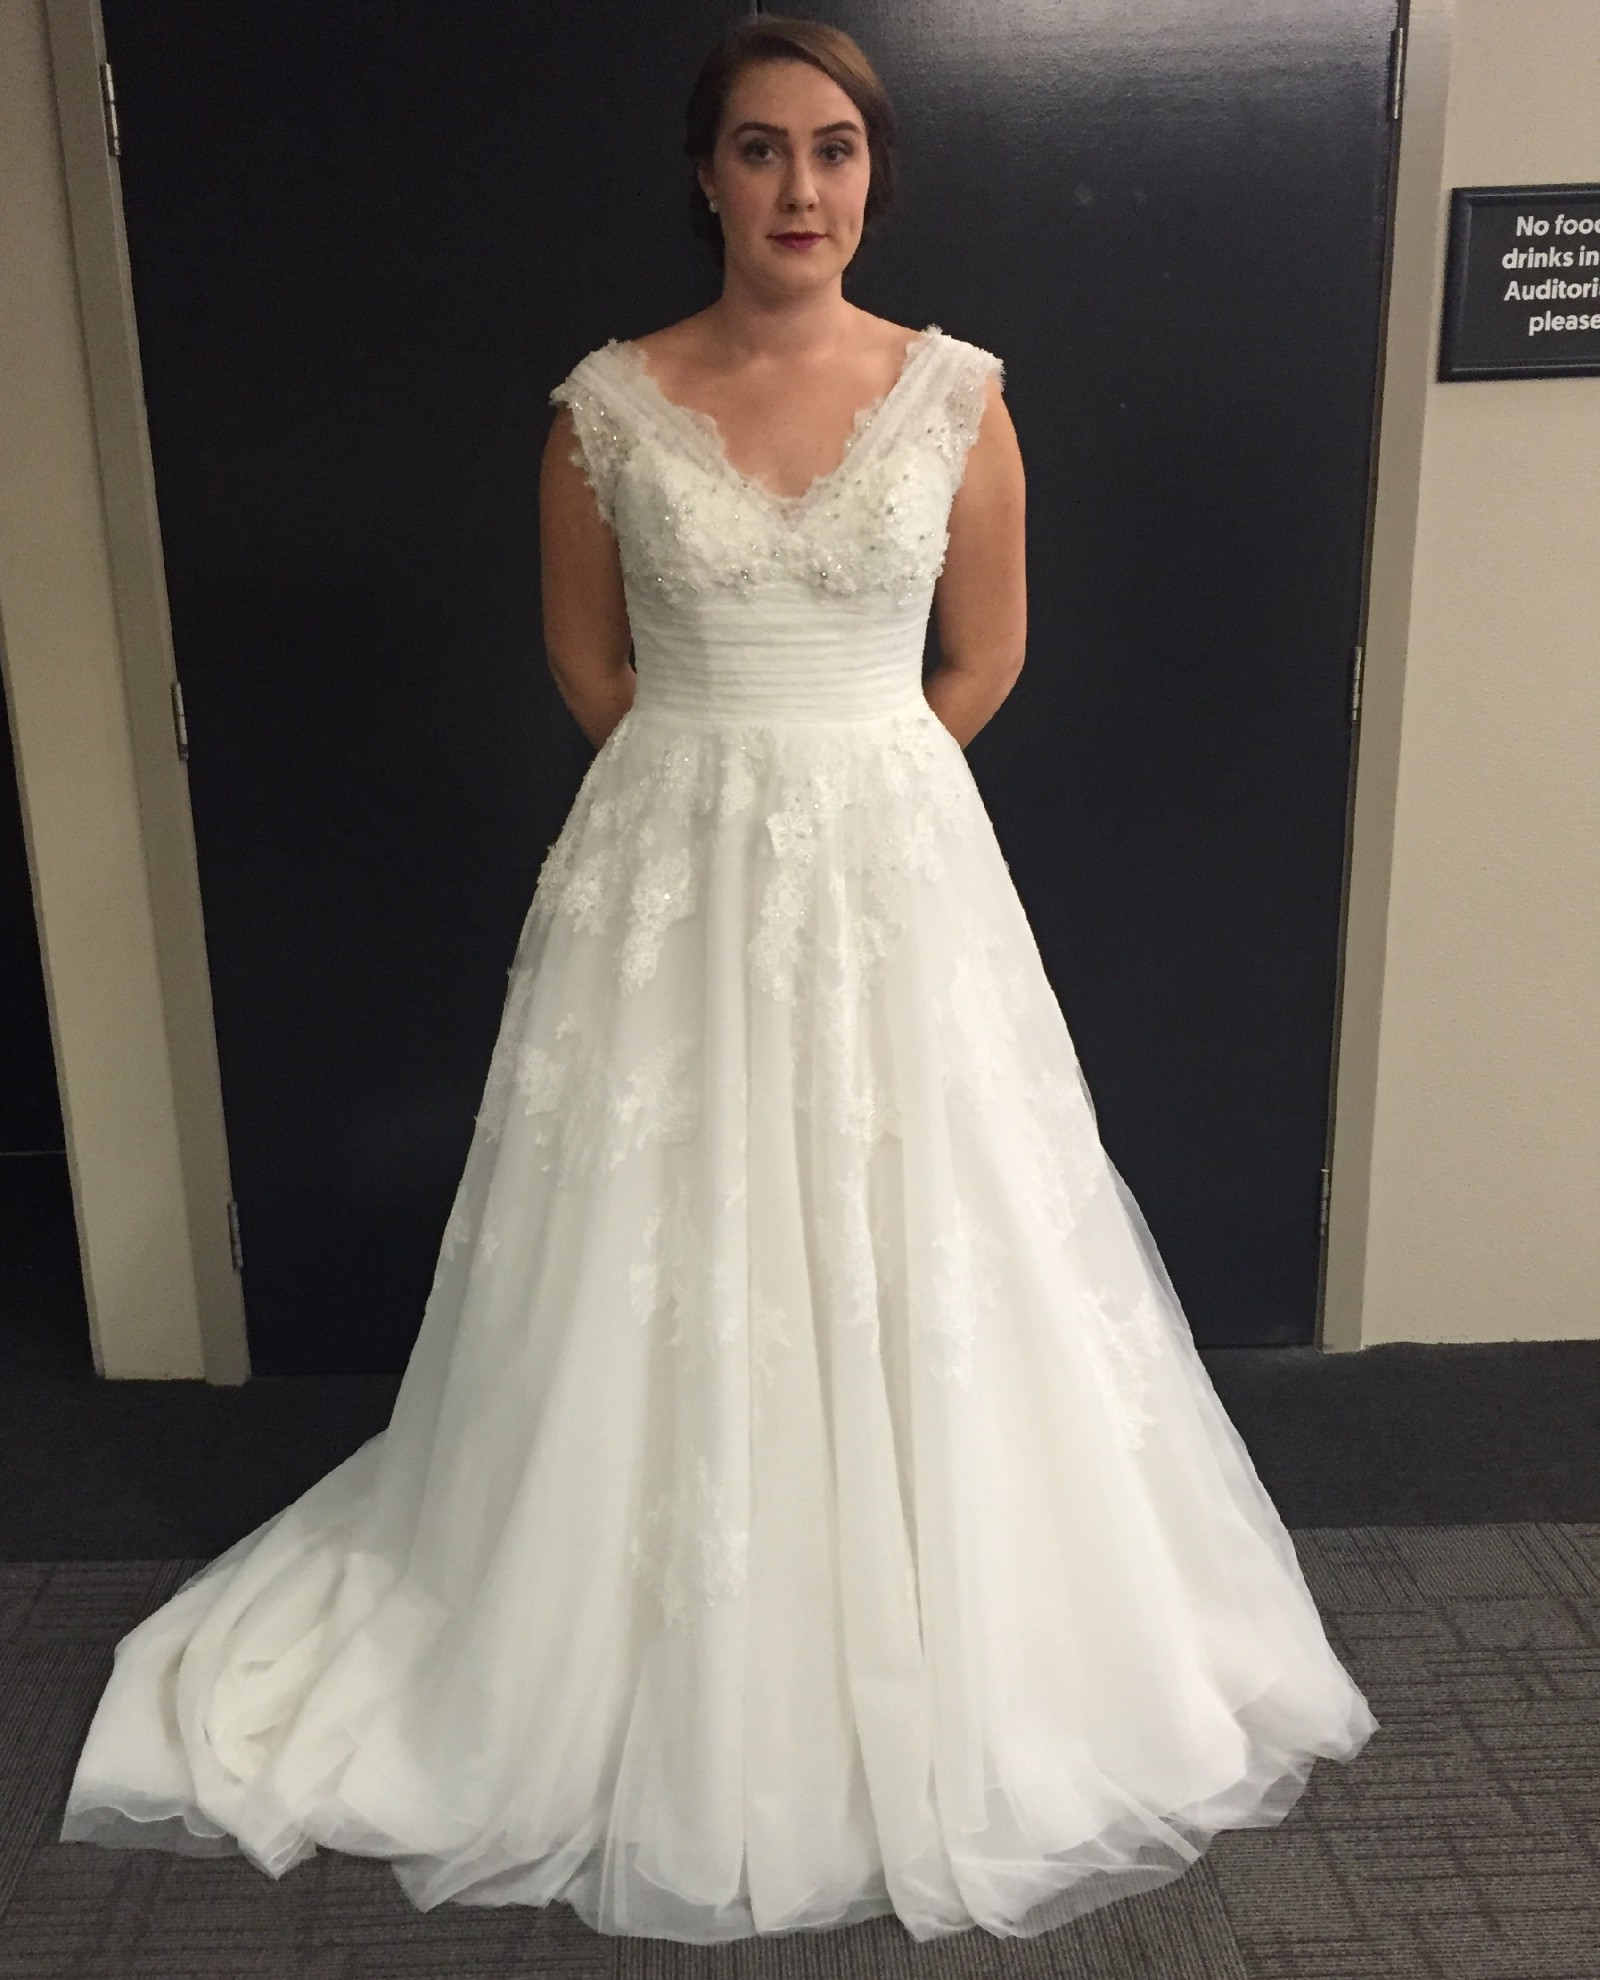 Collezione Bridal Couture Intuzuri Wedding Dress On Sale 66 Off